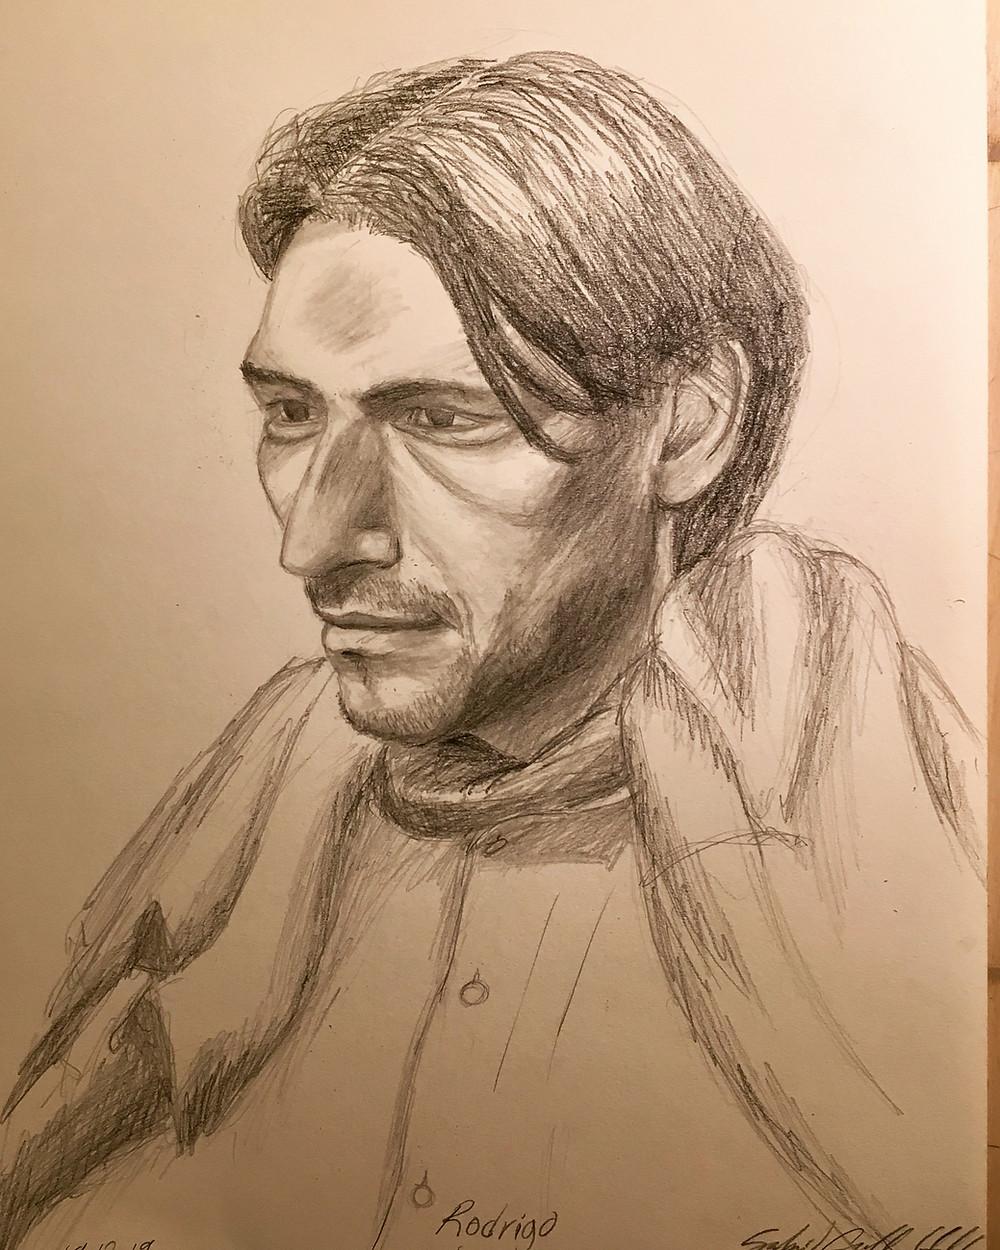 portrait of Rodrigo. Pencil, 42 x 30 cm.